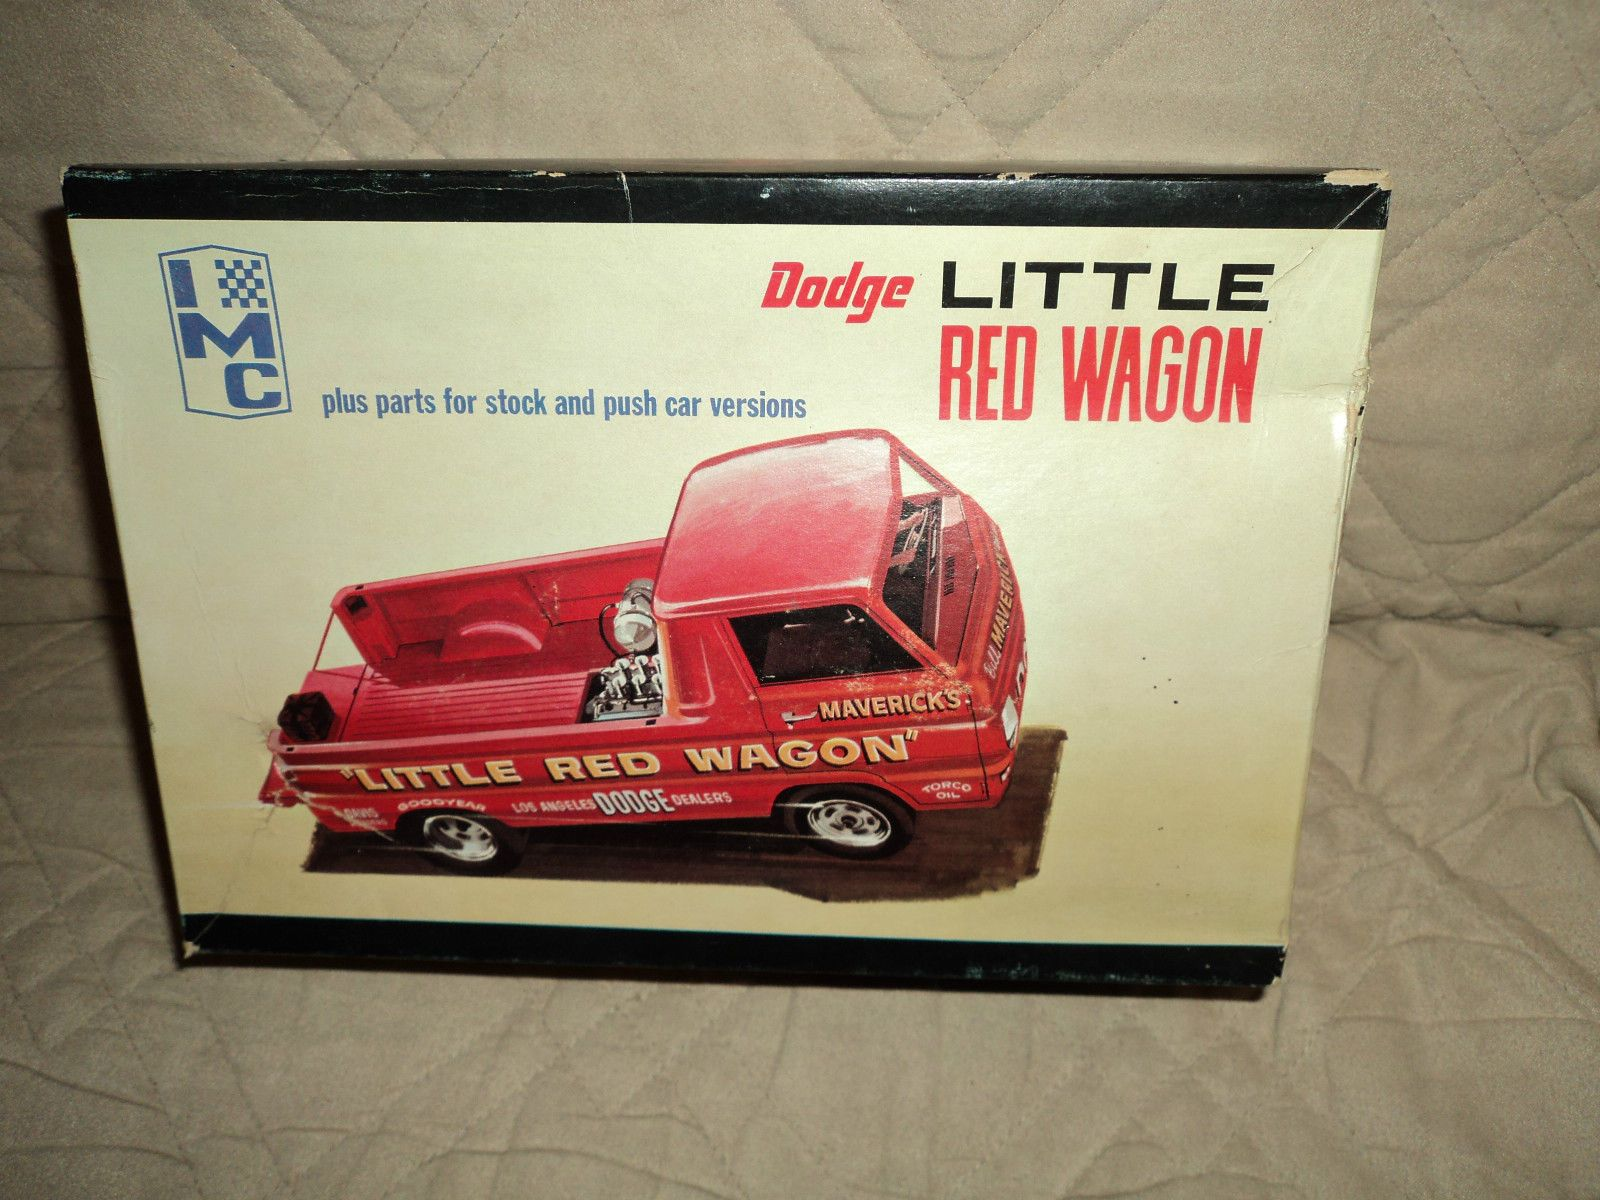 Vintage IMC Dodge Little Red Wagon Model Kit 107 200 Has ...